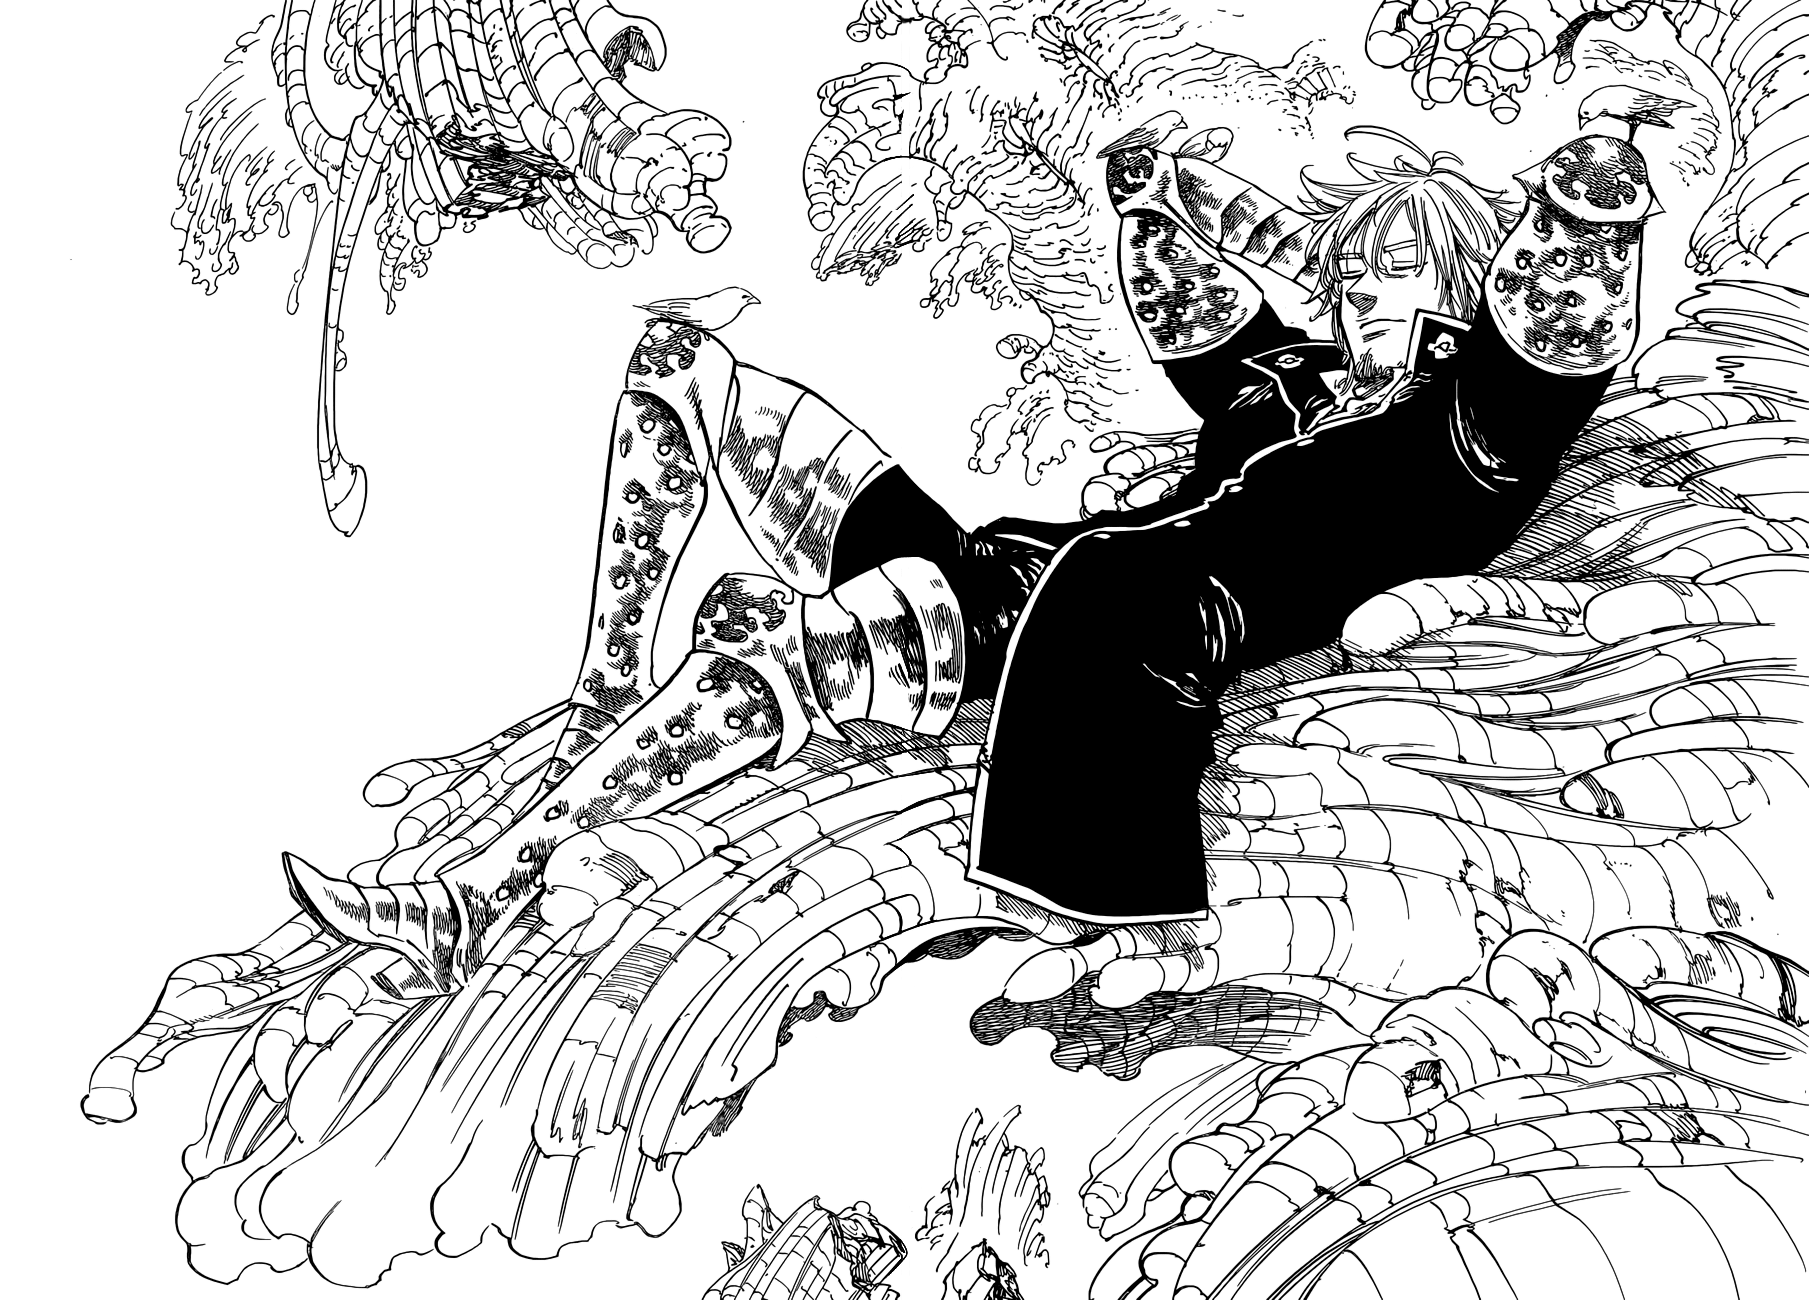 Nanatsu no Taizai - Thất Hình Đại Tội chap 113 page 19 - IZTruyenTranh.com